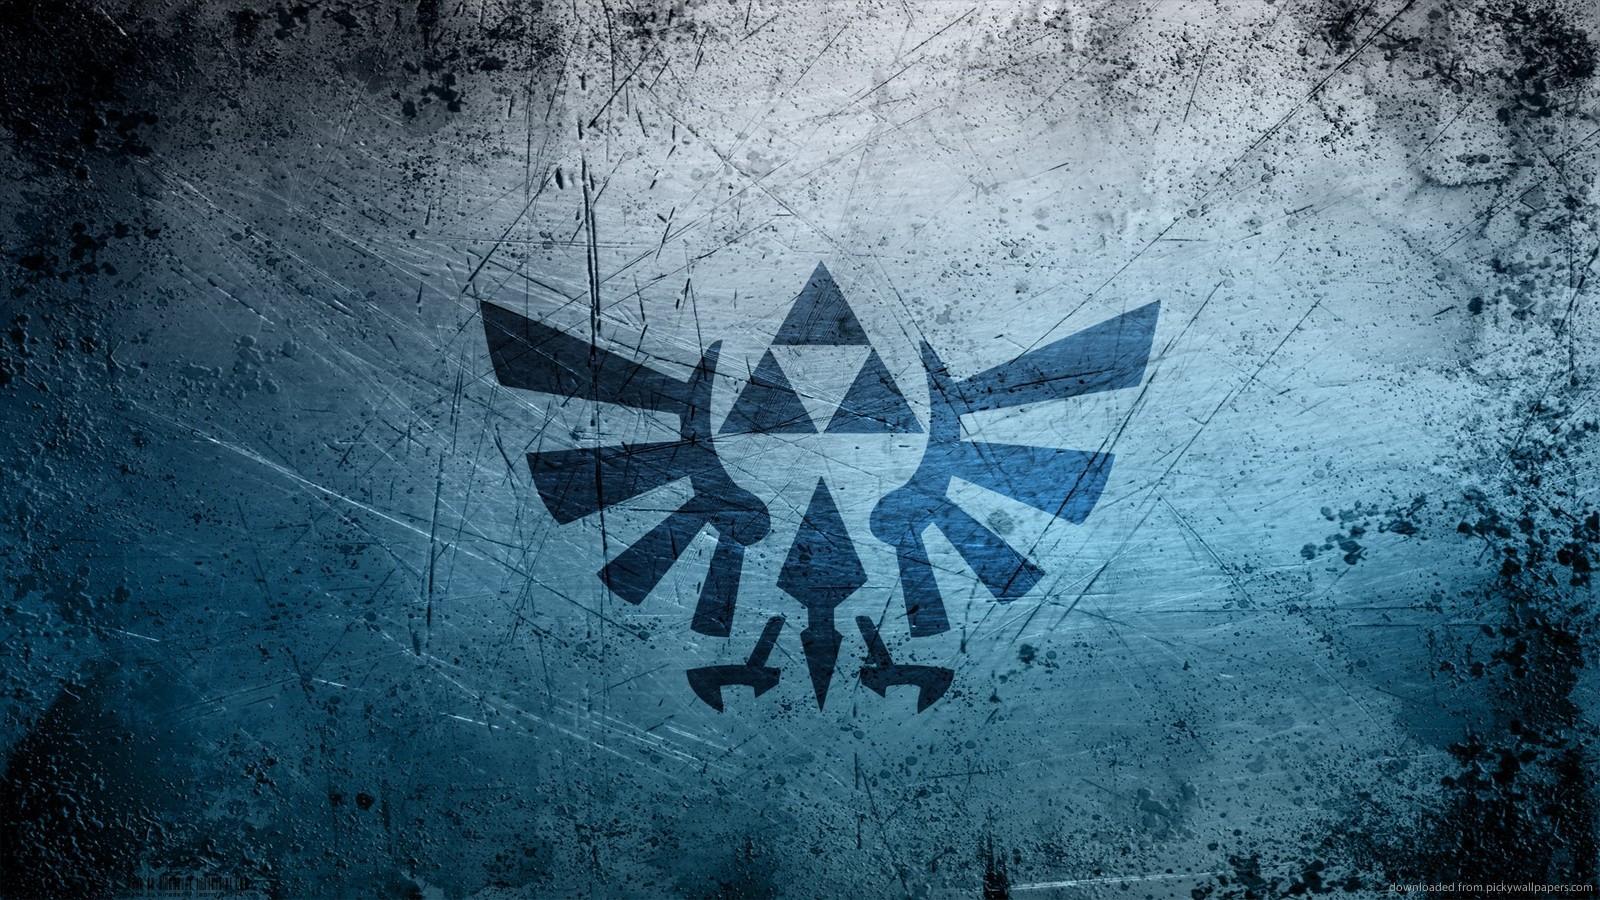 Download 1600x900 The Legend Of Zelda Grunge Logo Wallpaper 1600x900